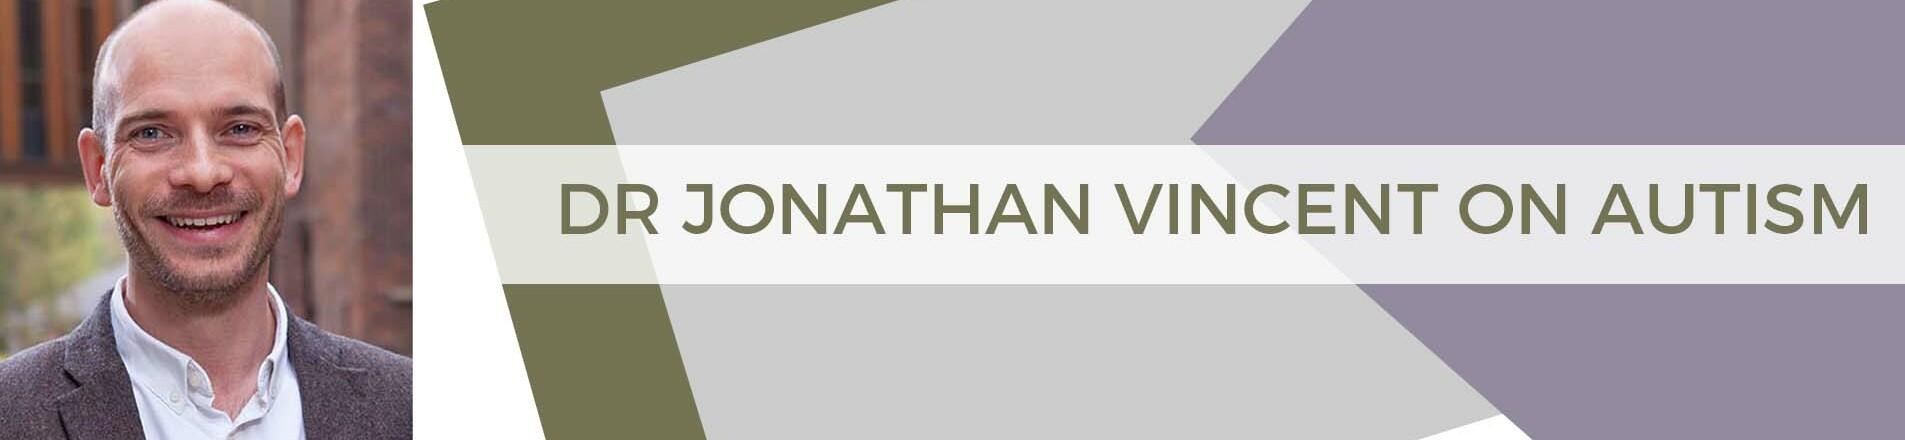 Dr Jonathan Vincent of York St John University talks autism